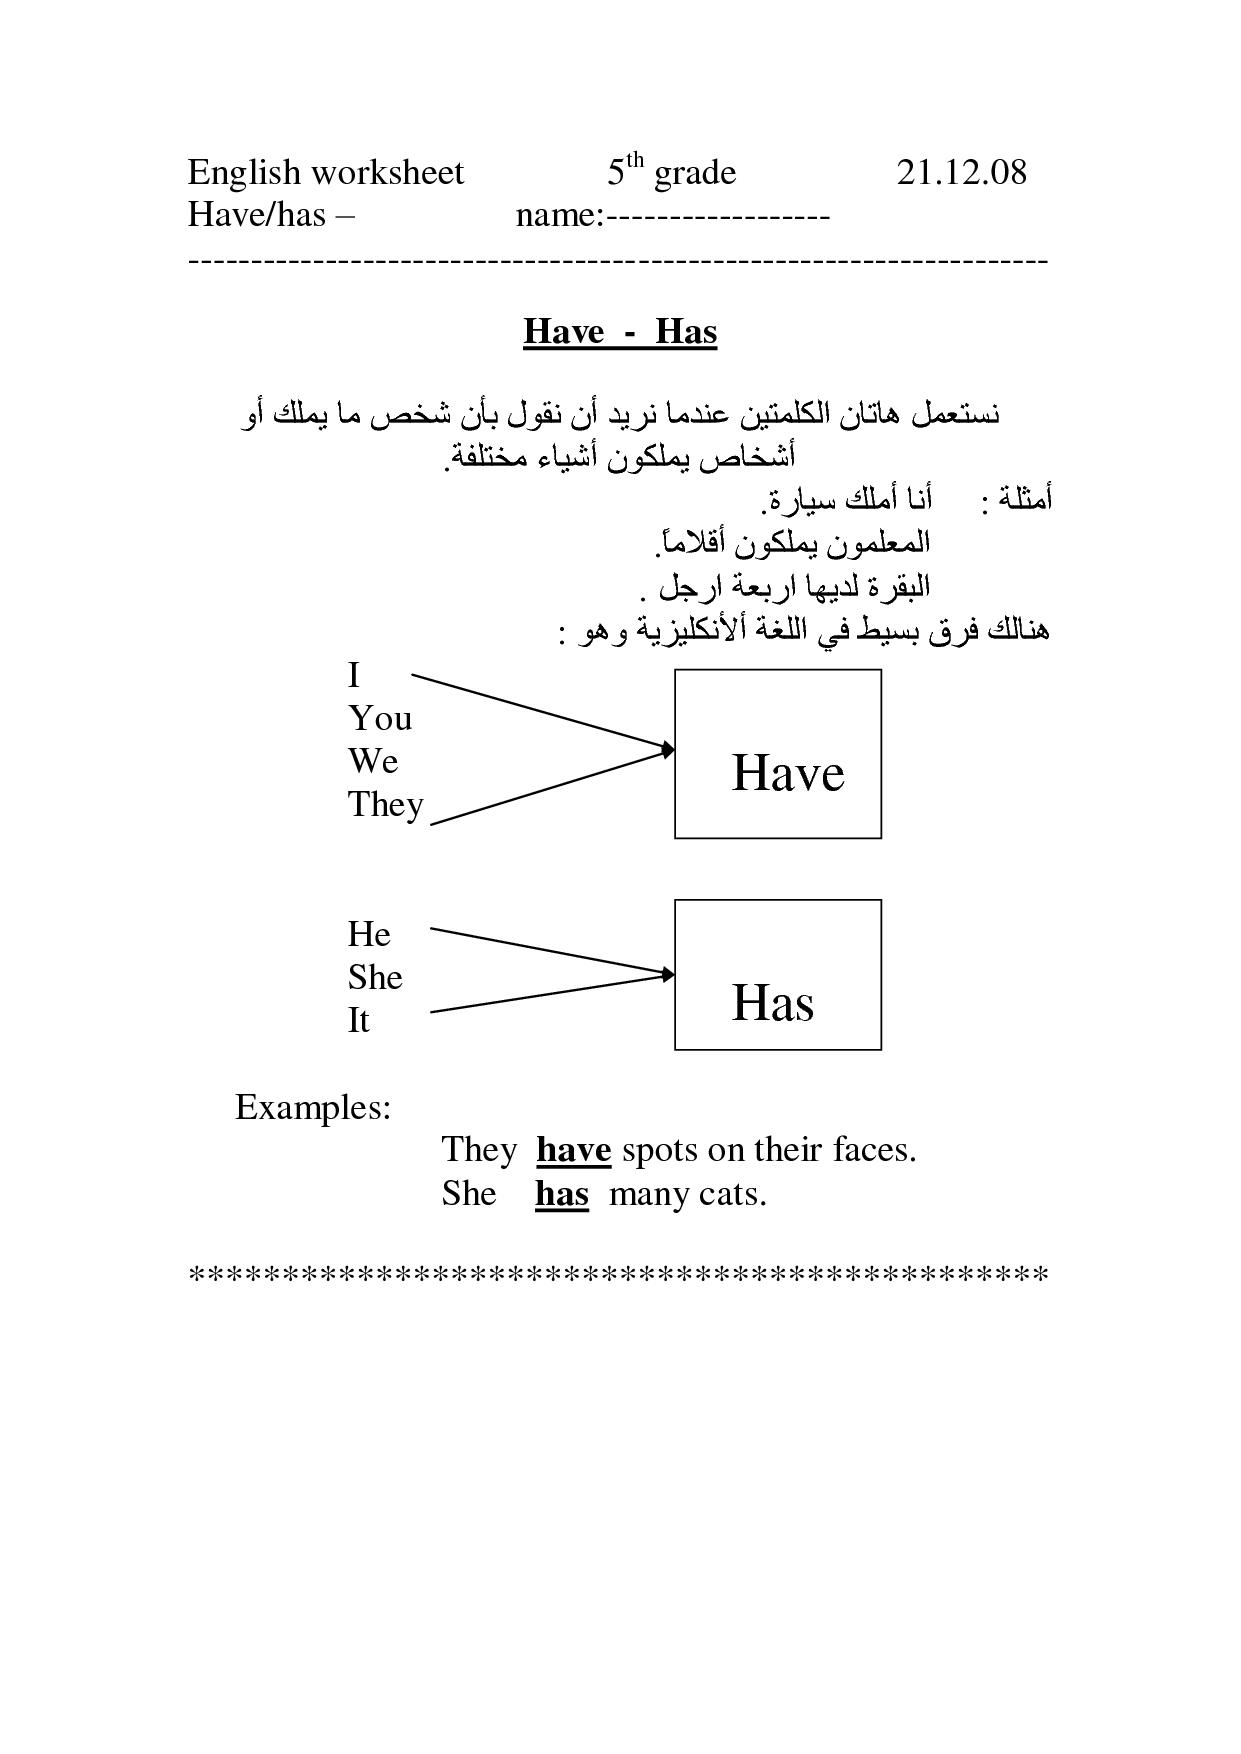 English Worksheet 6th Grade